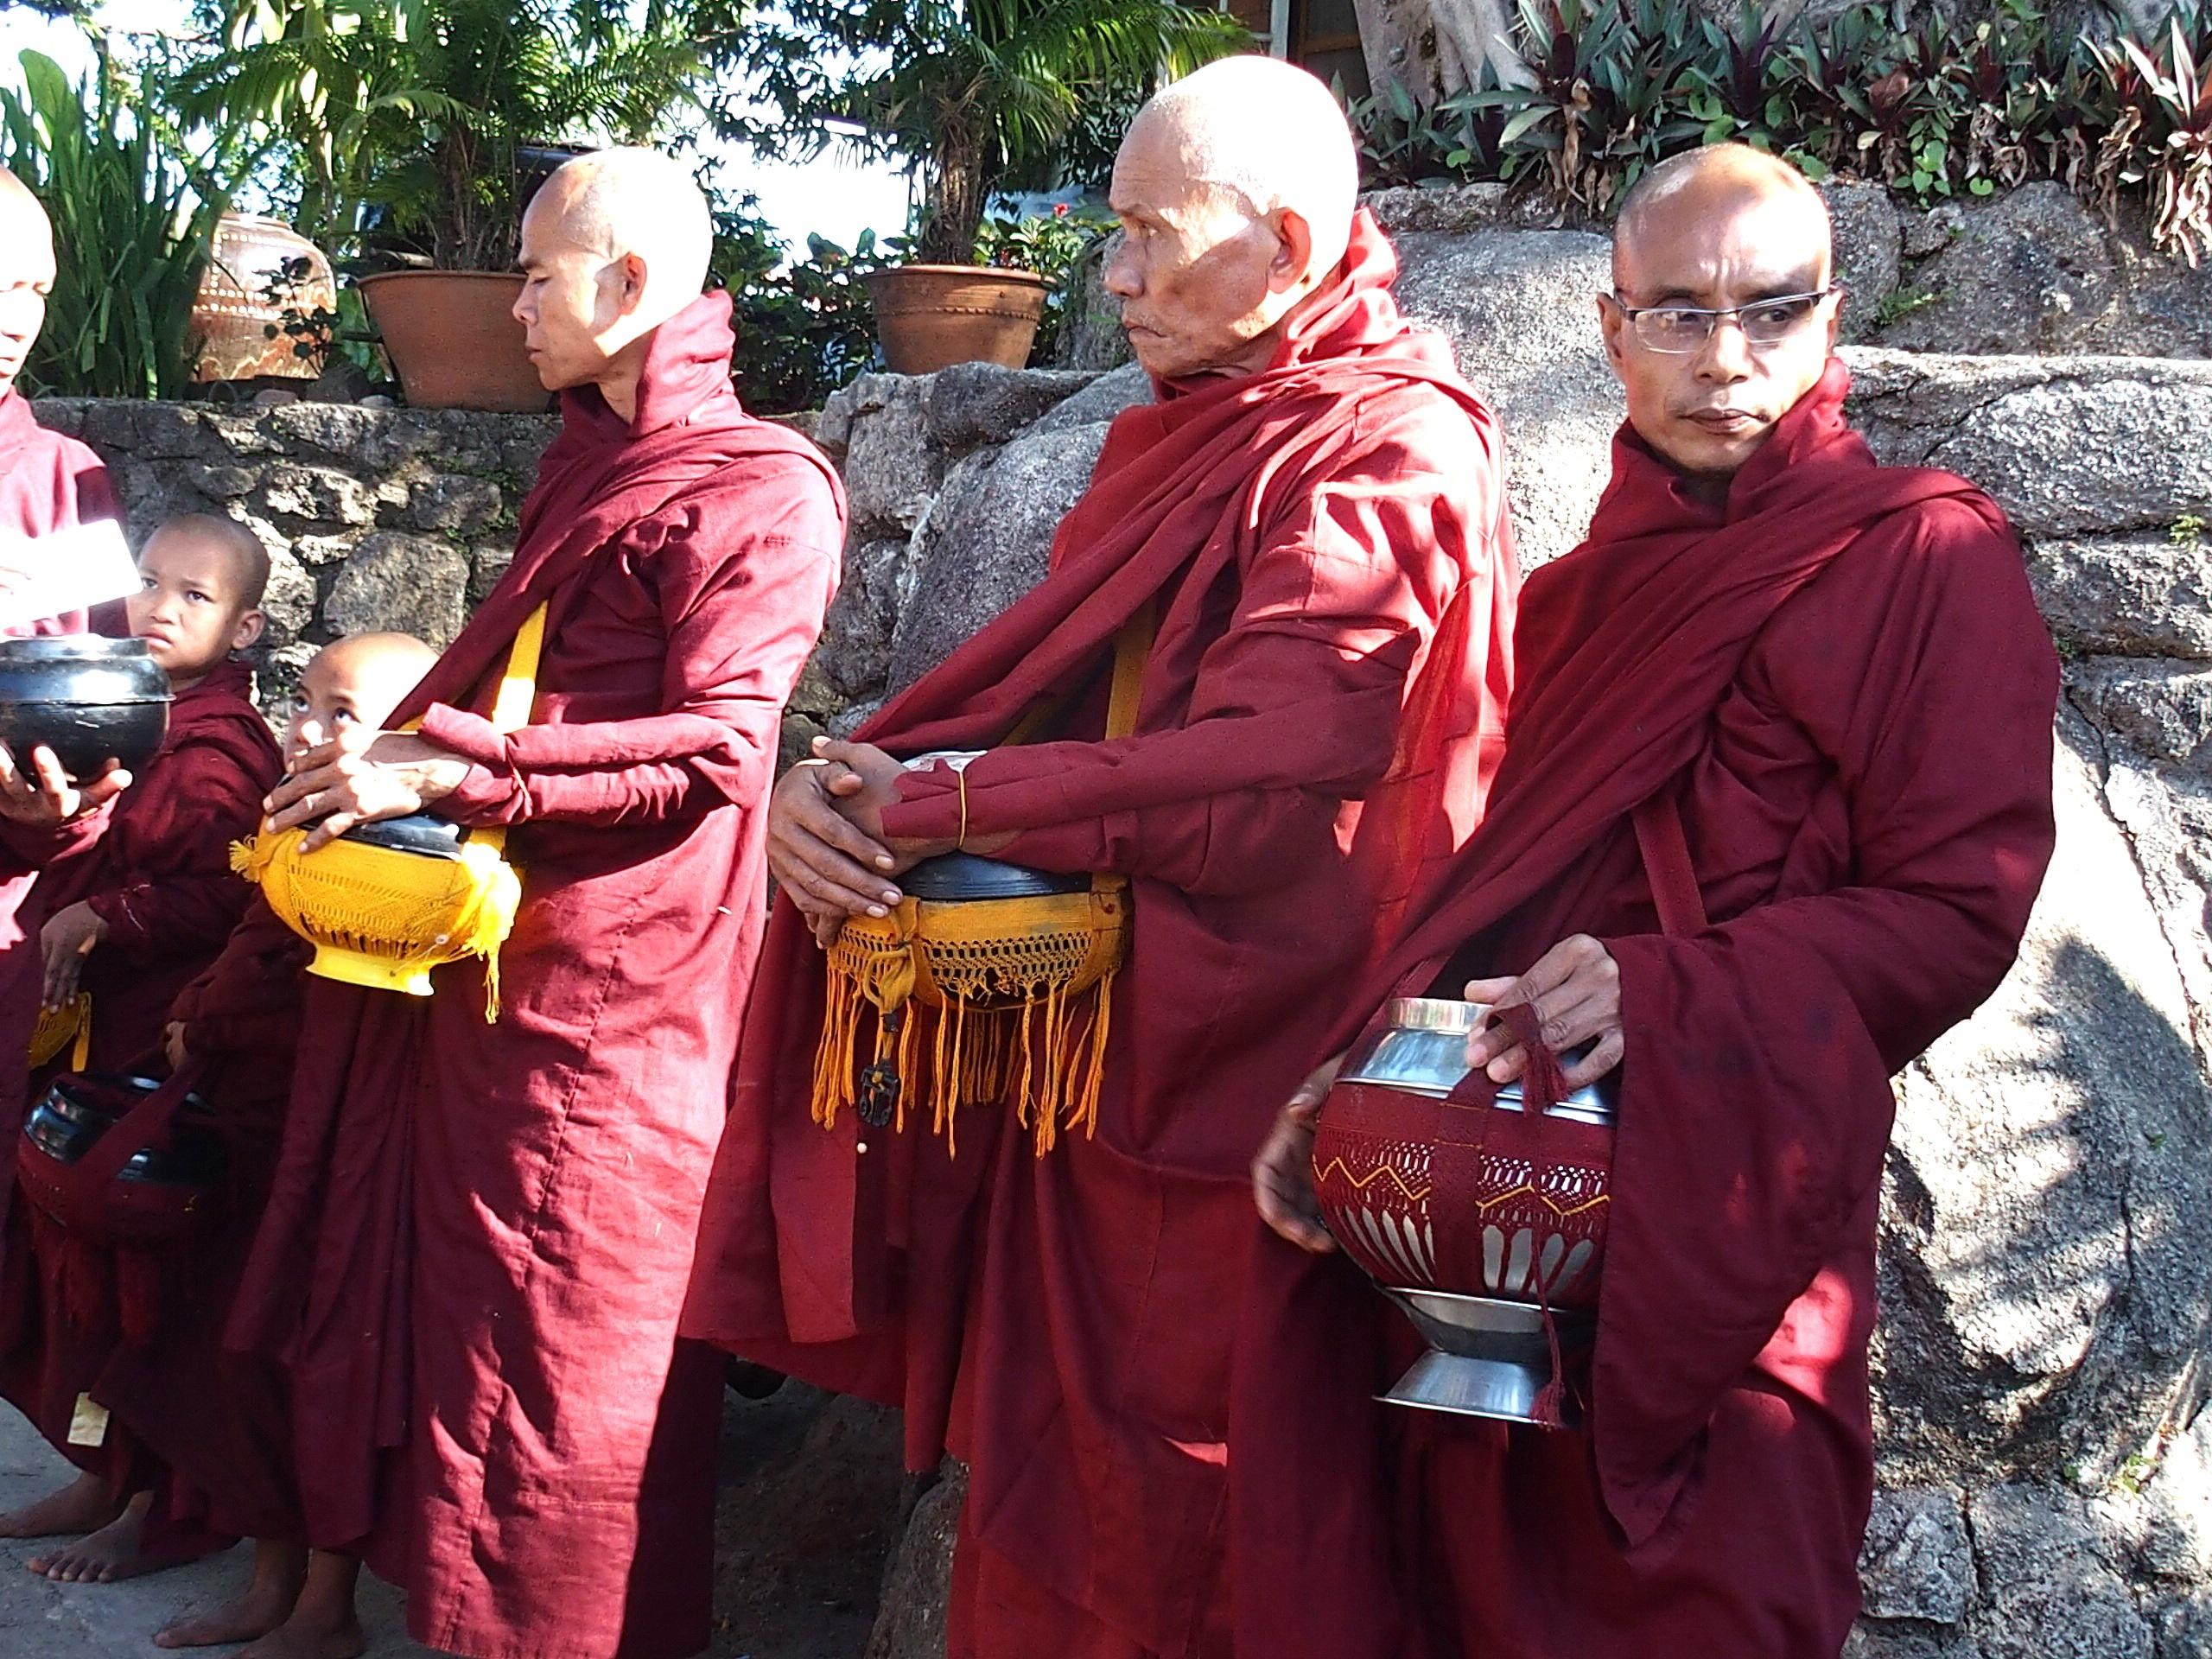 Moines-avec-bols-daumones-Rocher-dOr-Birmanie.